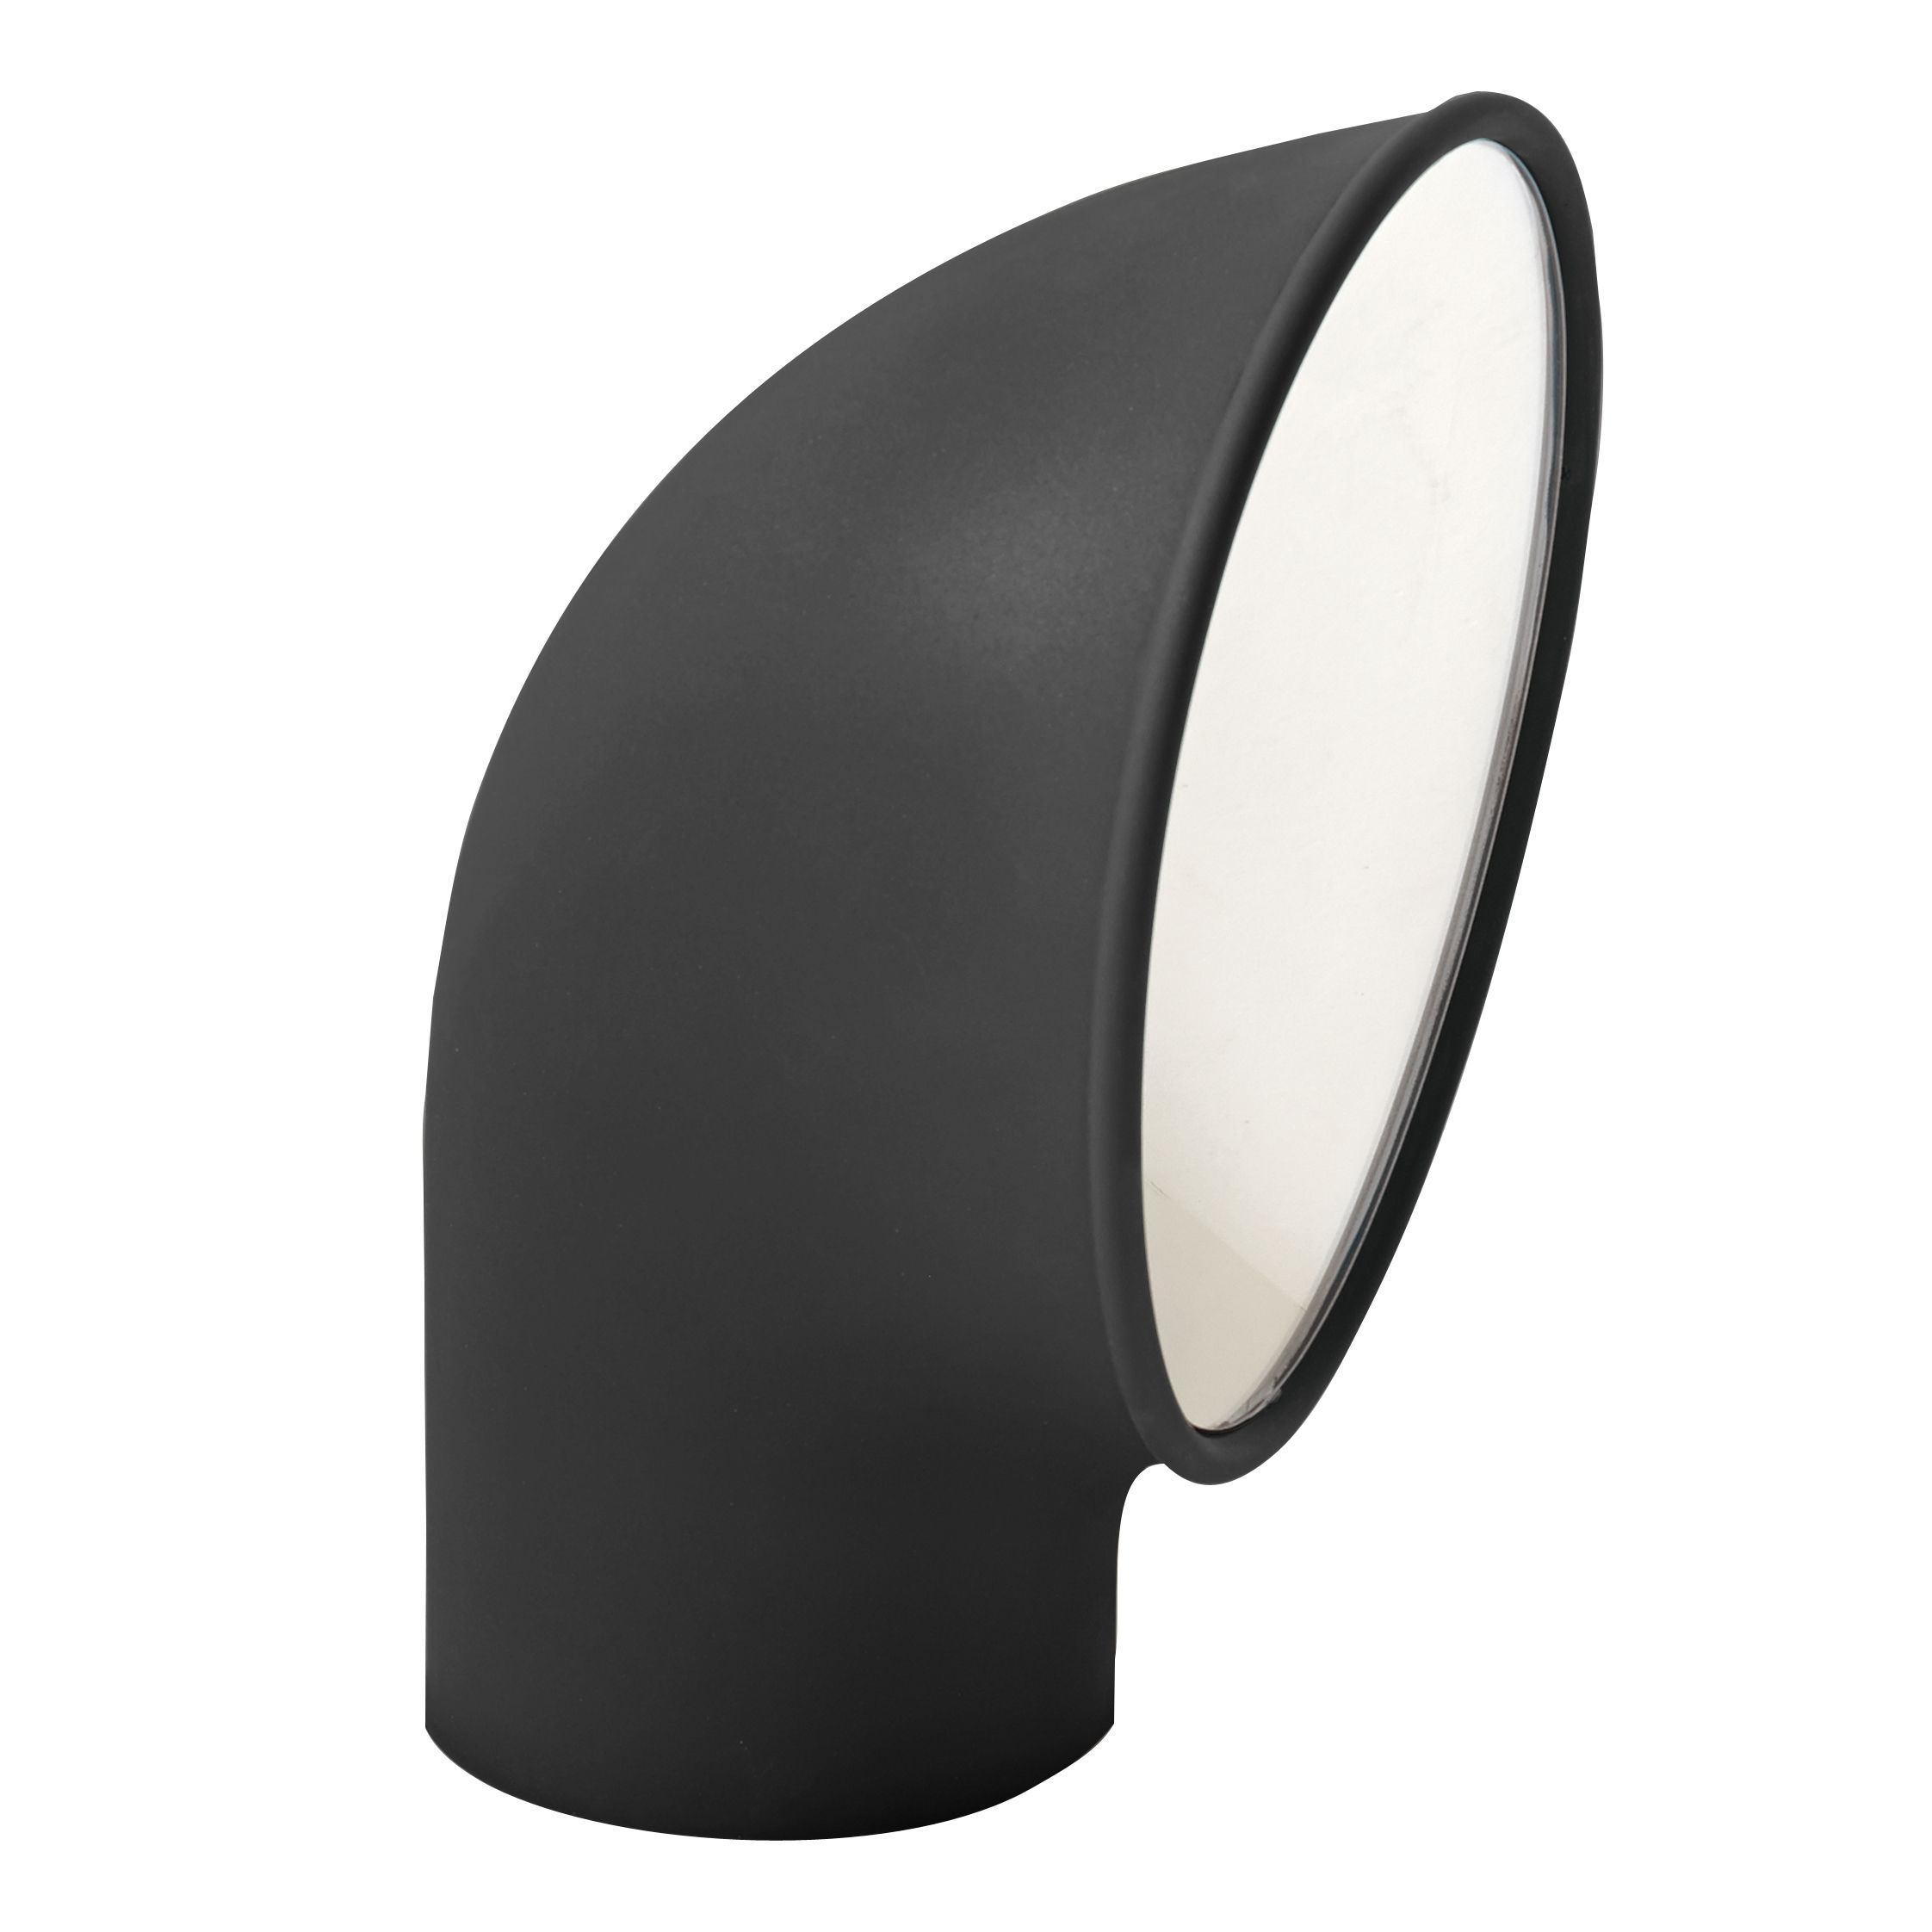 Lighting - Outdoor Lighting - Piroscafo Garden light - LED - H 37 cm by Artemide - Grey - Cast aluminium, Polycarbonate